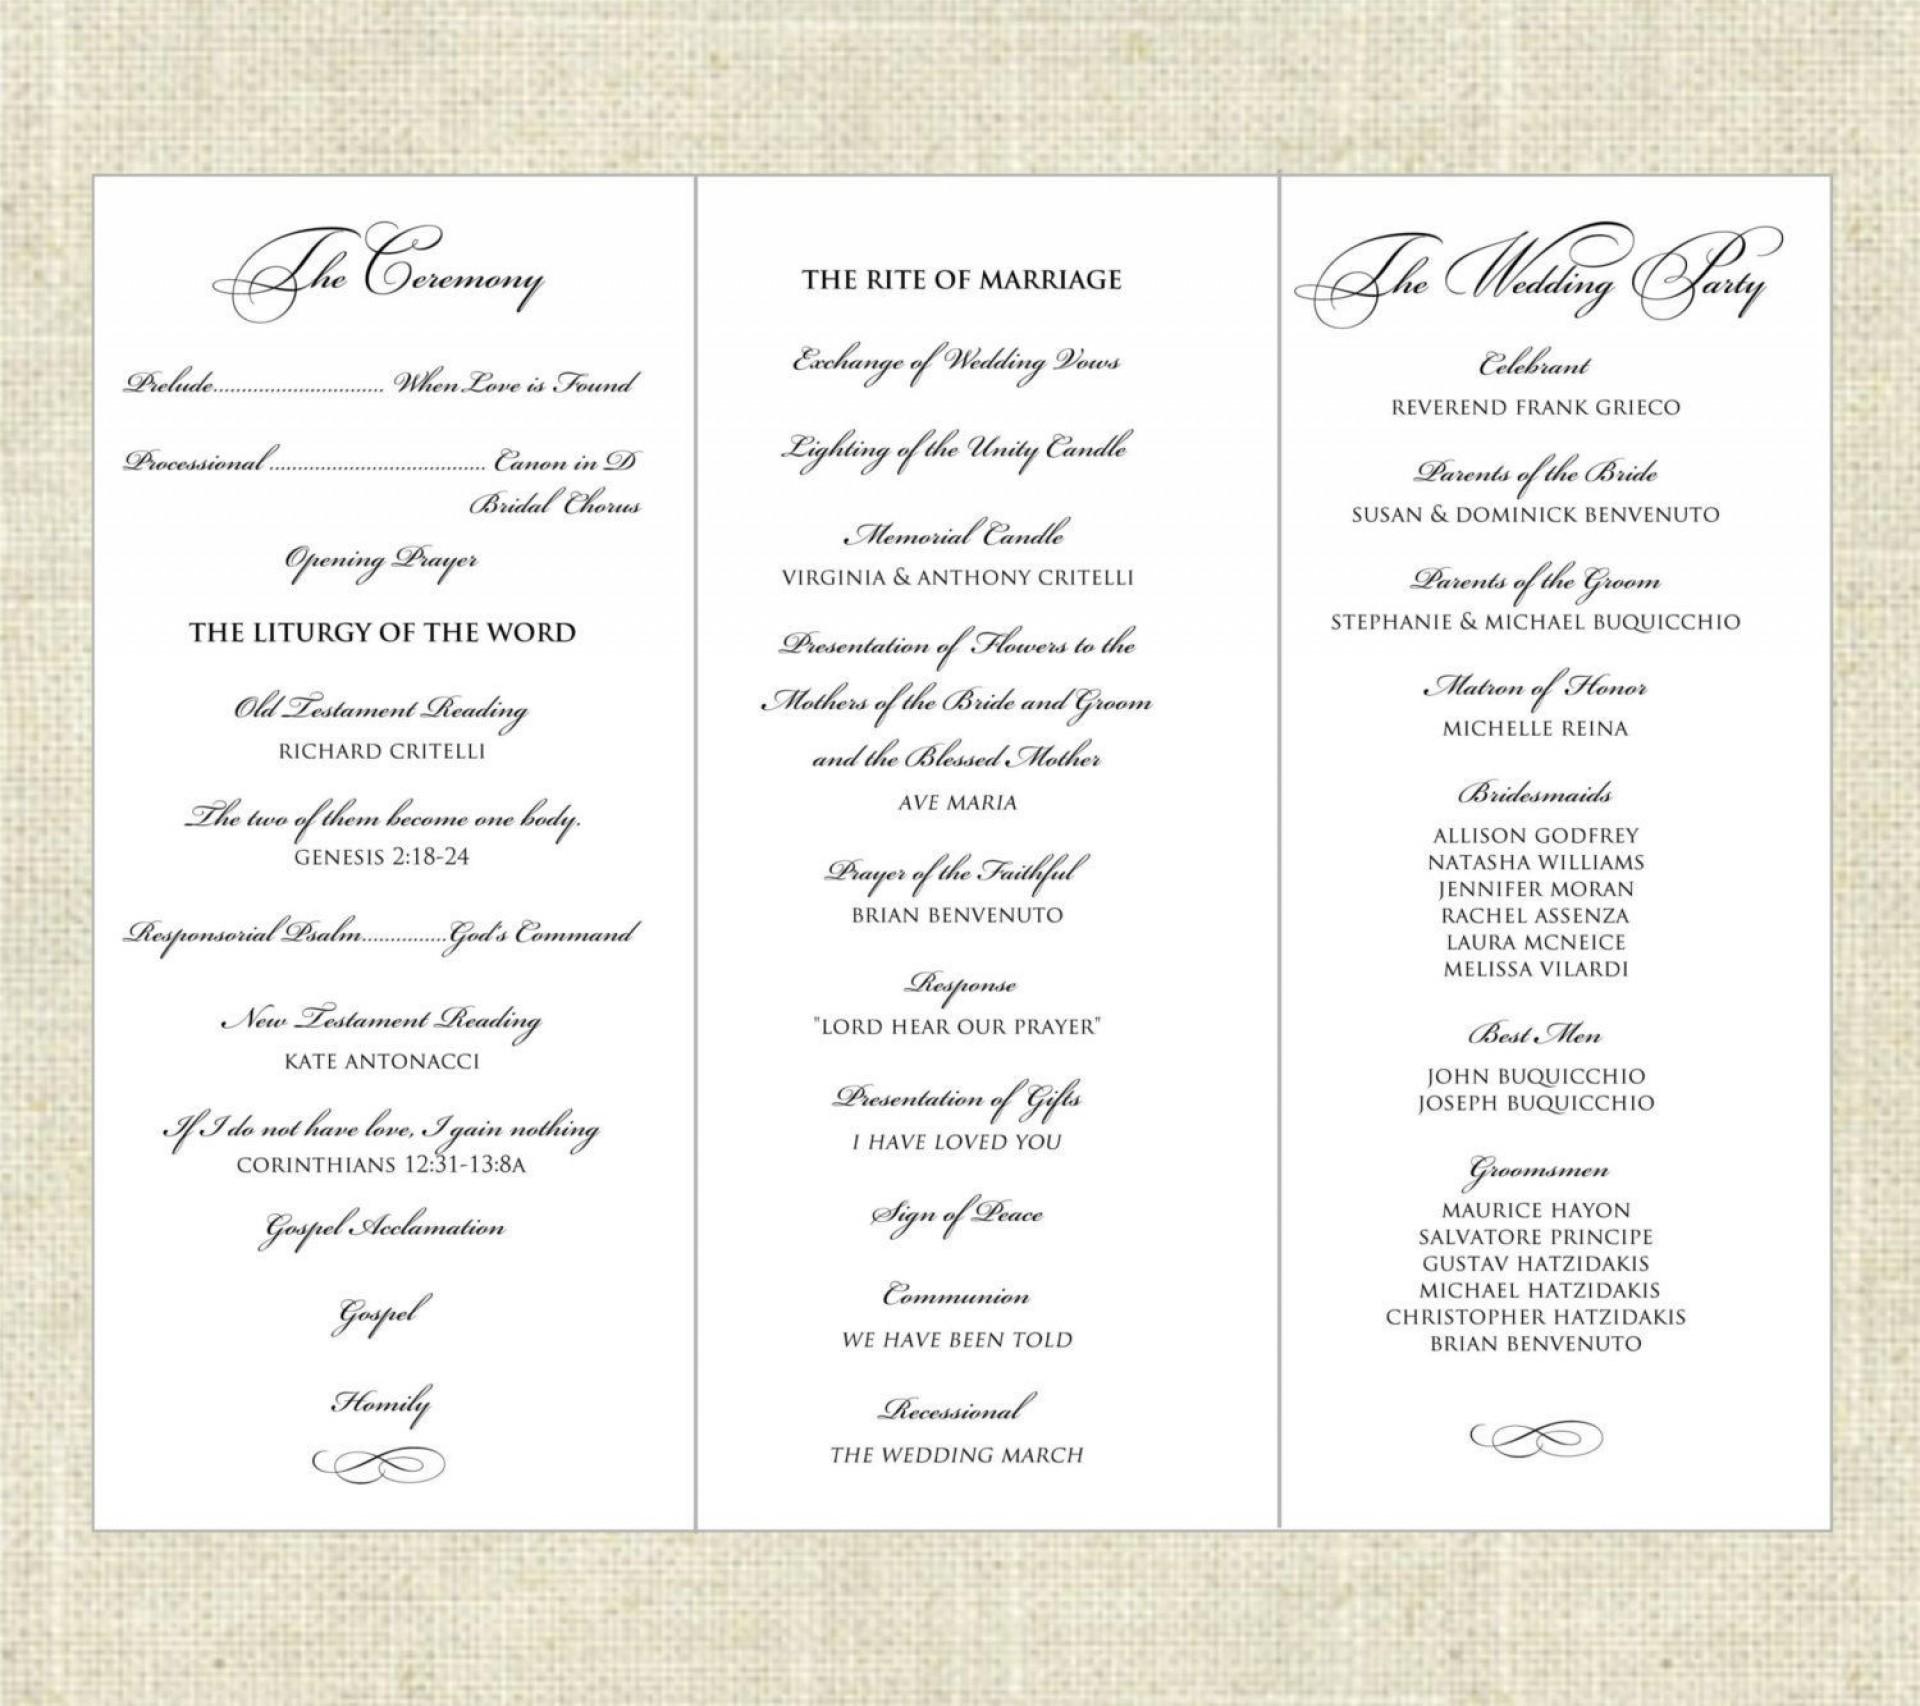 001 Fantastic Trifold Wedding Program Template High Def  Templates Tri Fold Tri-fold Publisher Free Foldable1920